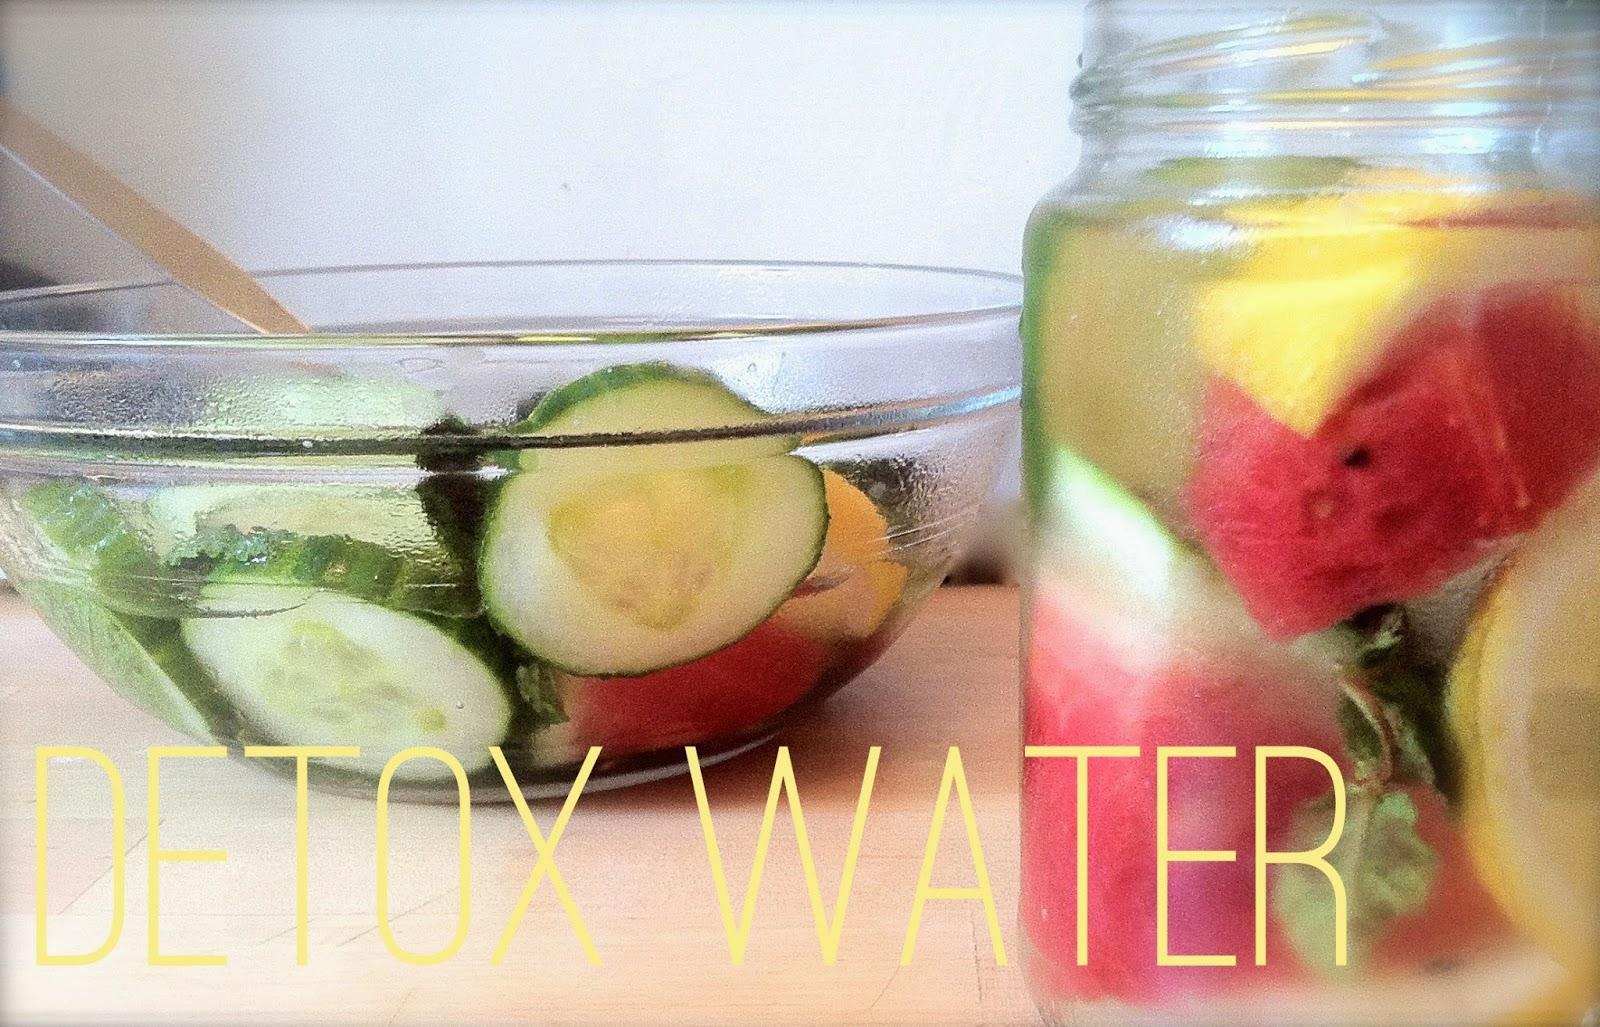 Watermelon, cucumber, mint and lemon detox water